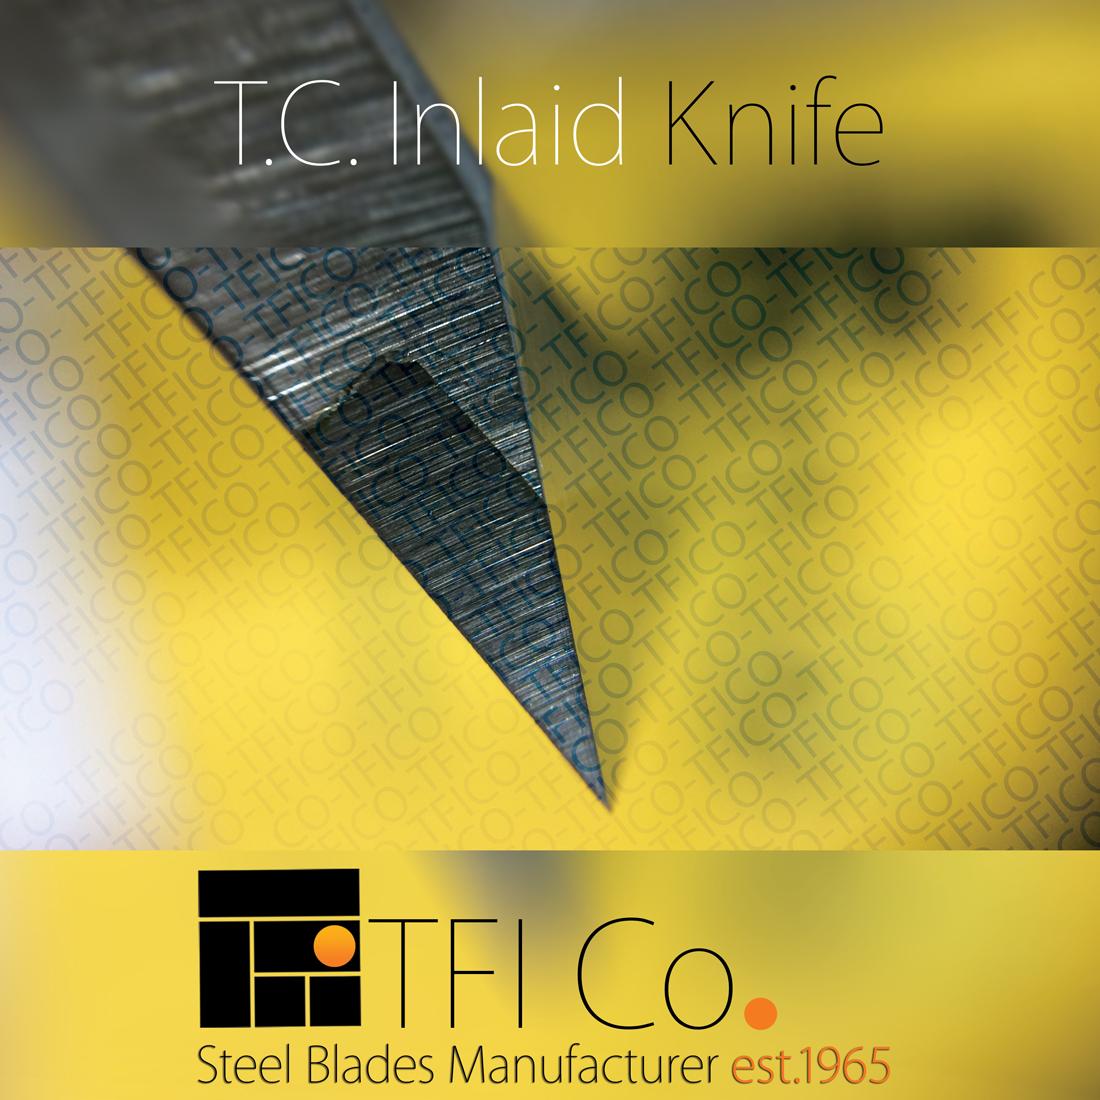 Gridning Tungsten carbide blades UAE oman Steel blade, machine knives, sharpening, tfico , long